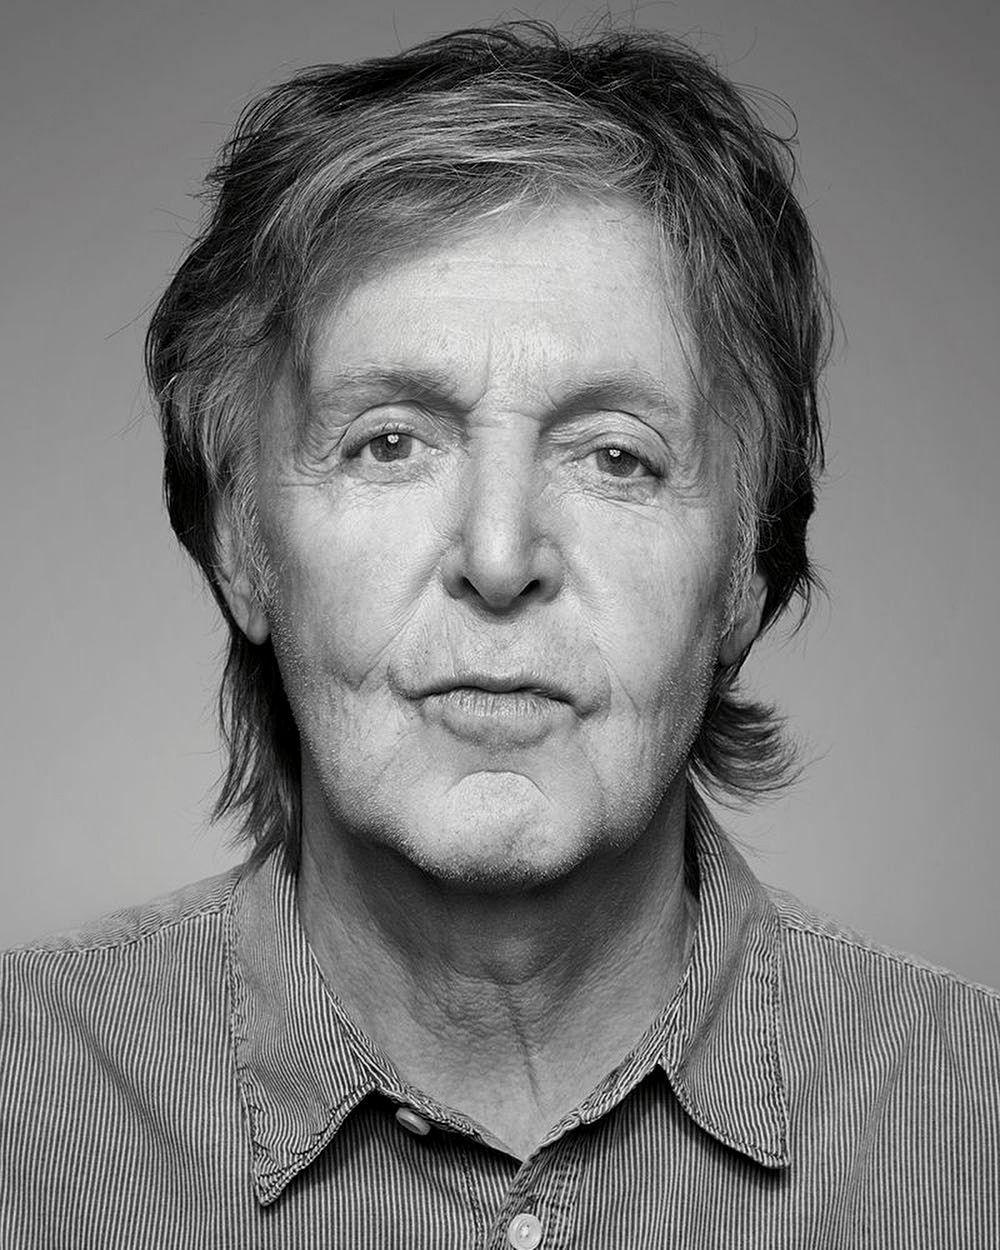 Paul McCartney by Martin Schoeller